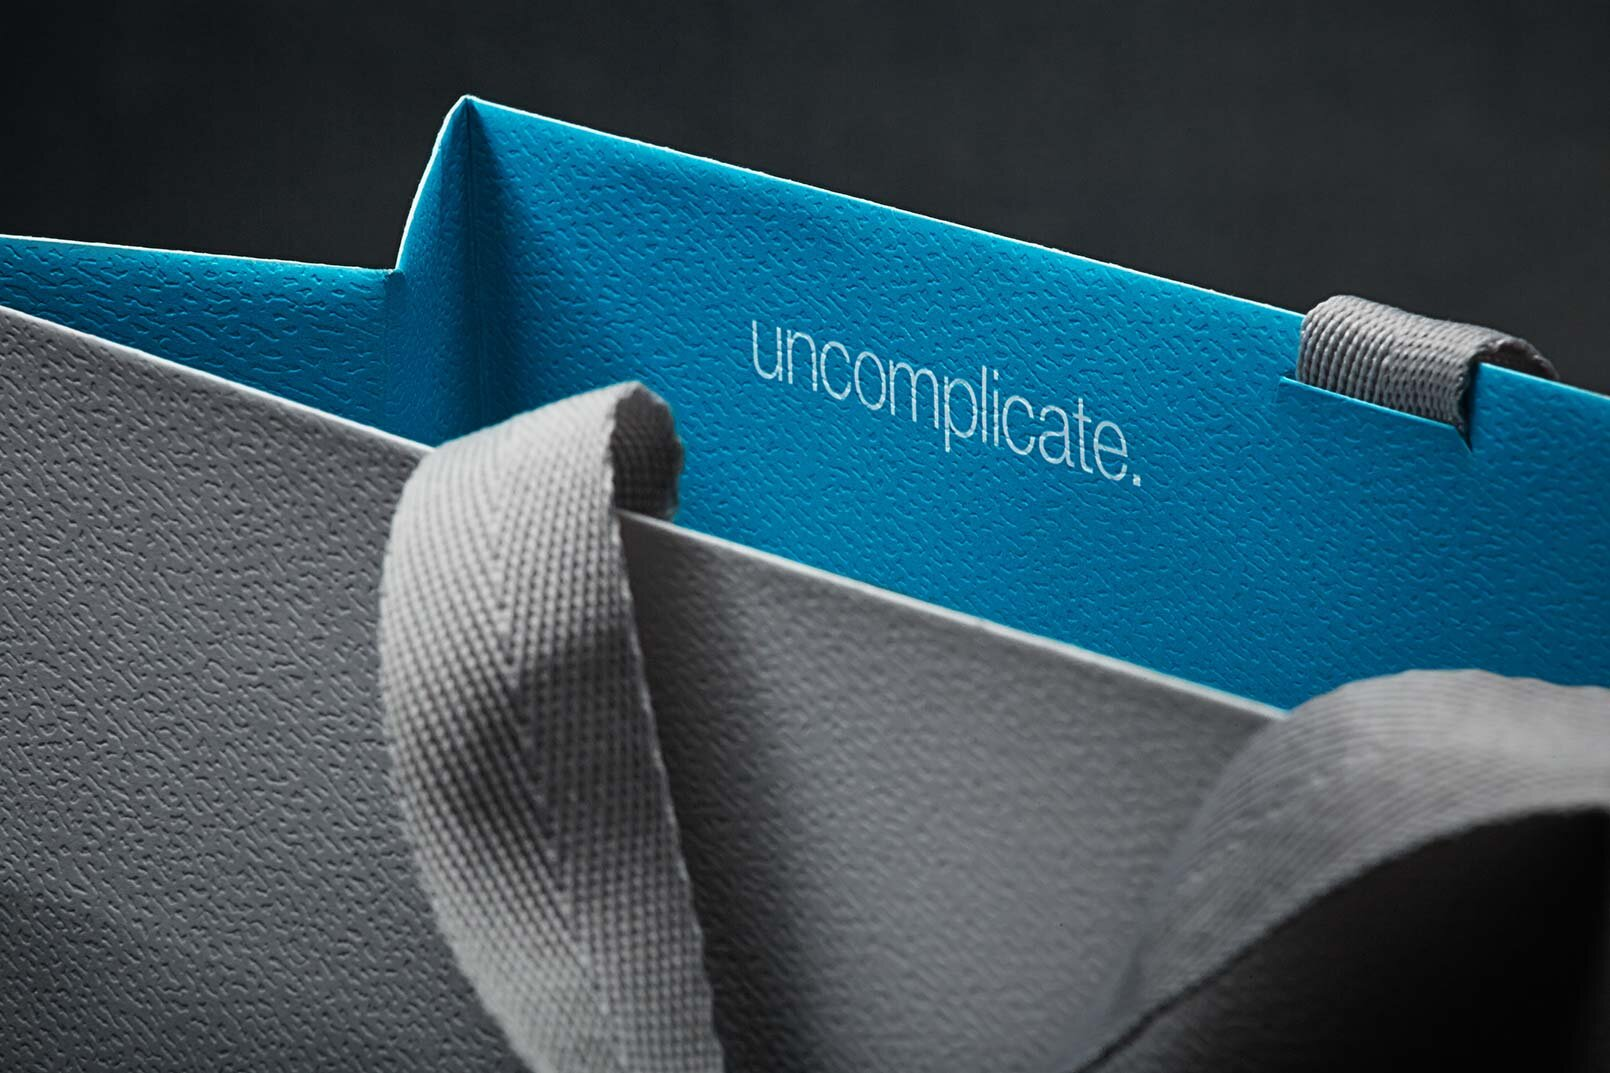 Jjill-Shopping-Bag-Design-Packaging-Company-2.JPG